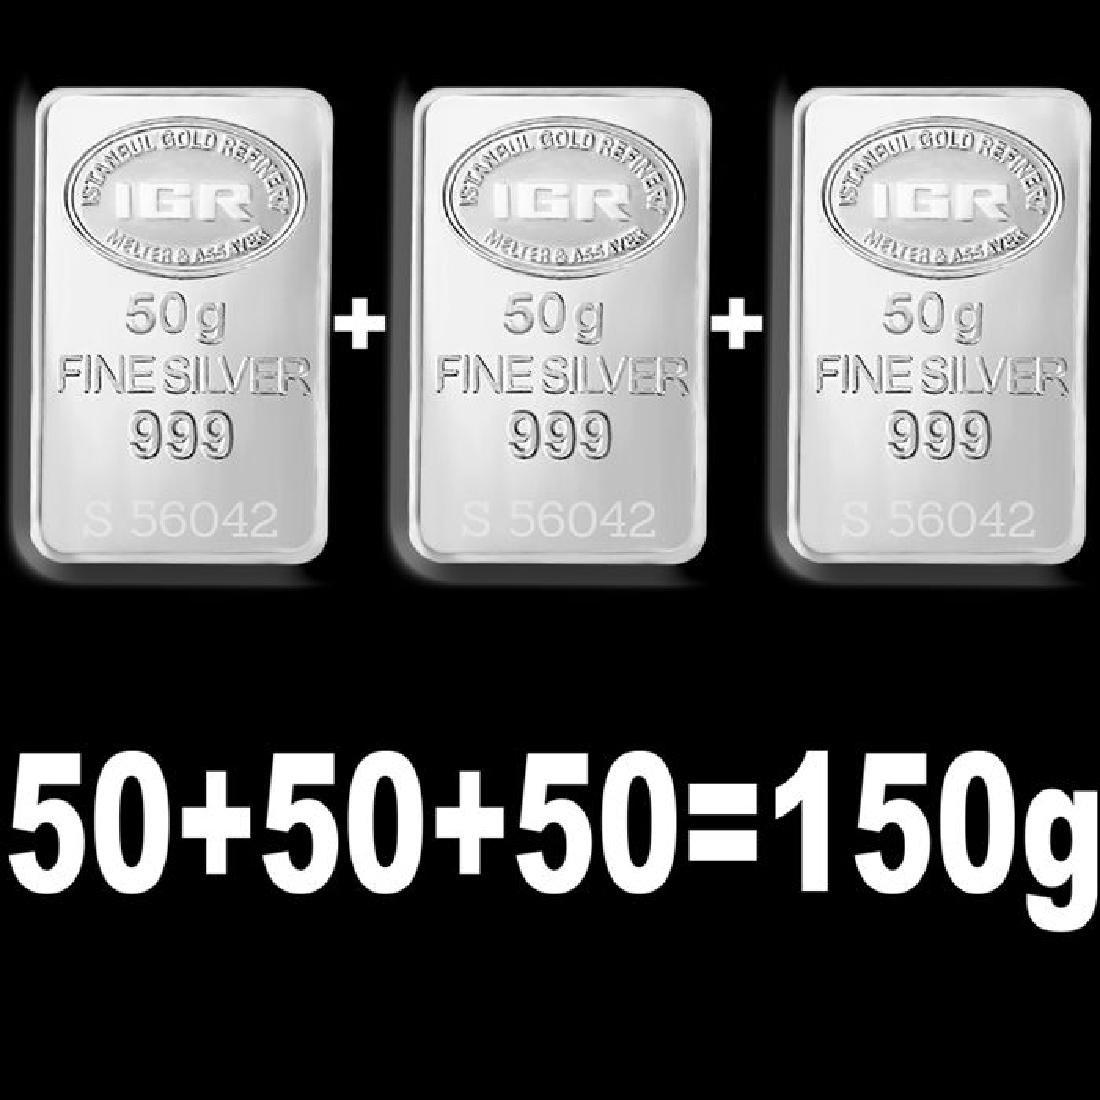 3 x 50 gr. - 999/1000 - Minted/ Sealed Silver Bar - 3